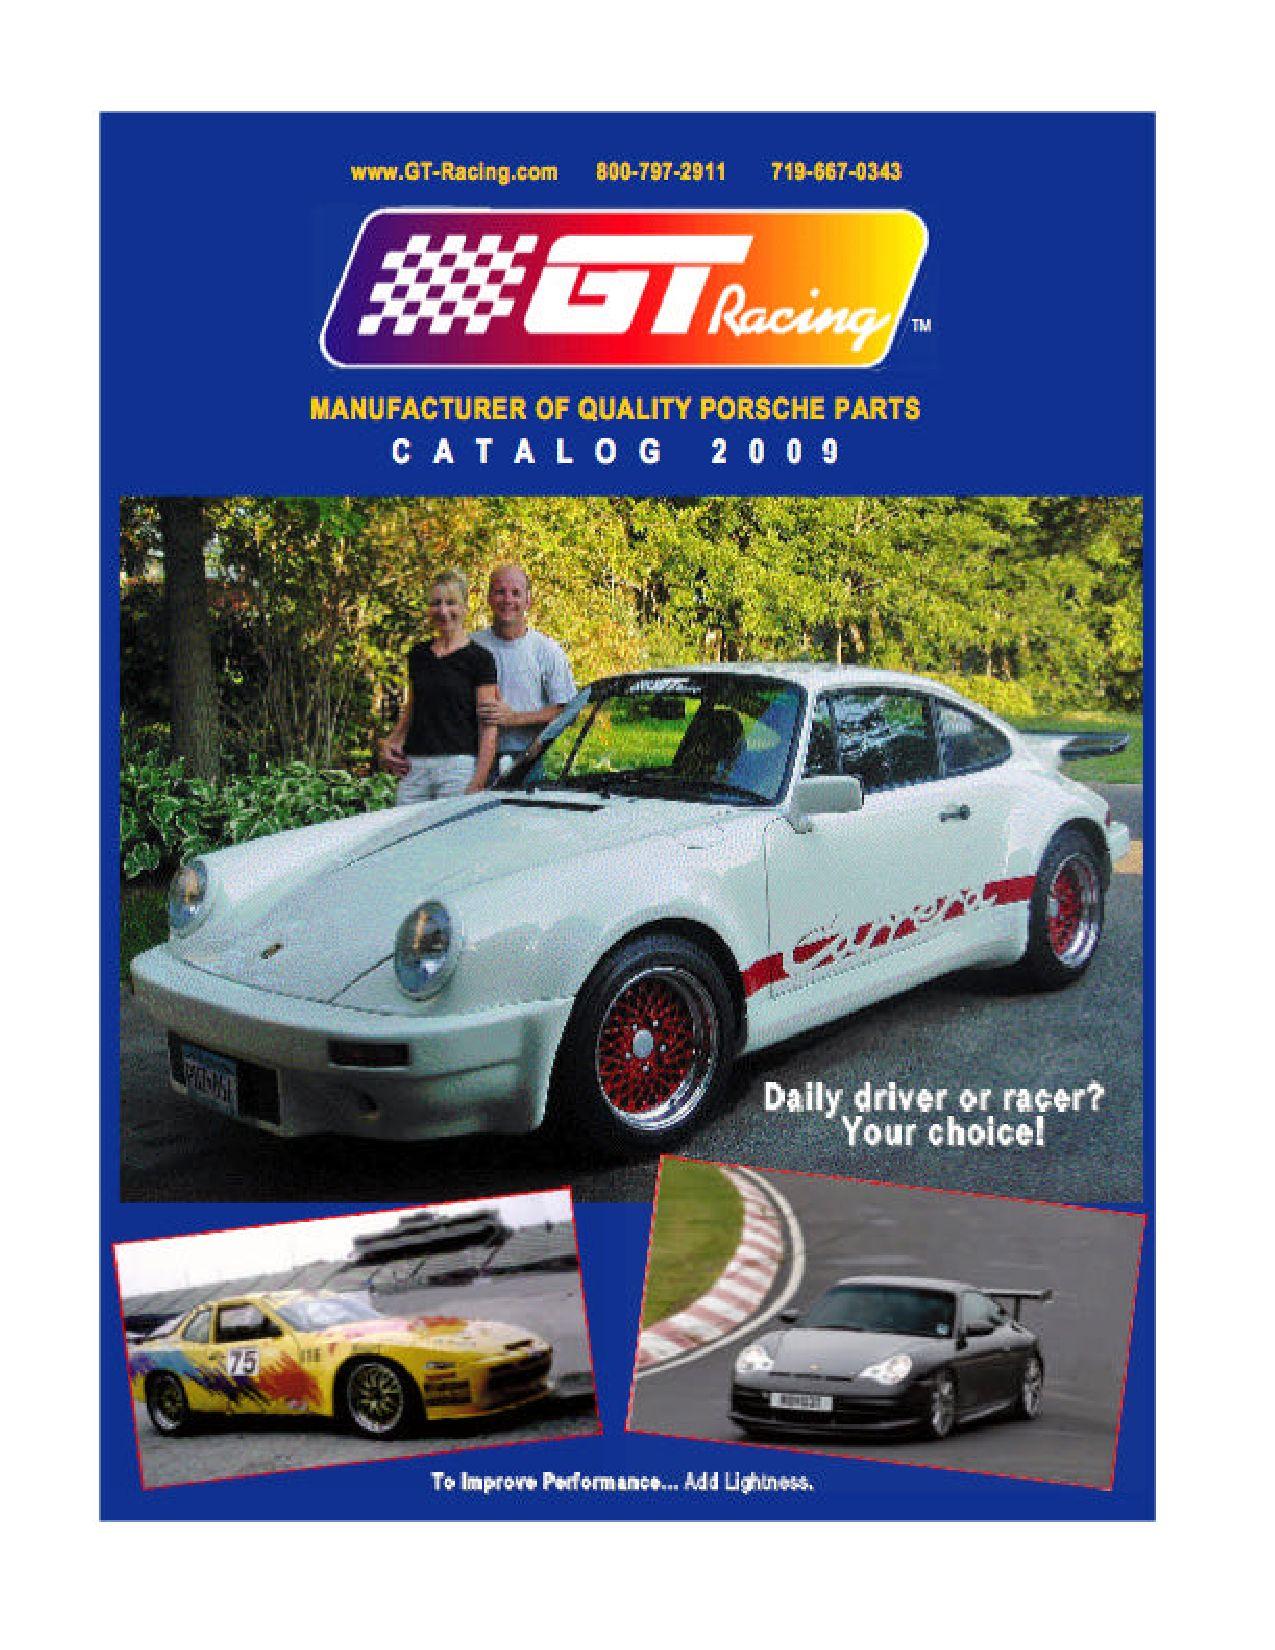 GT Racing Catalog by smokemuse - issuu